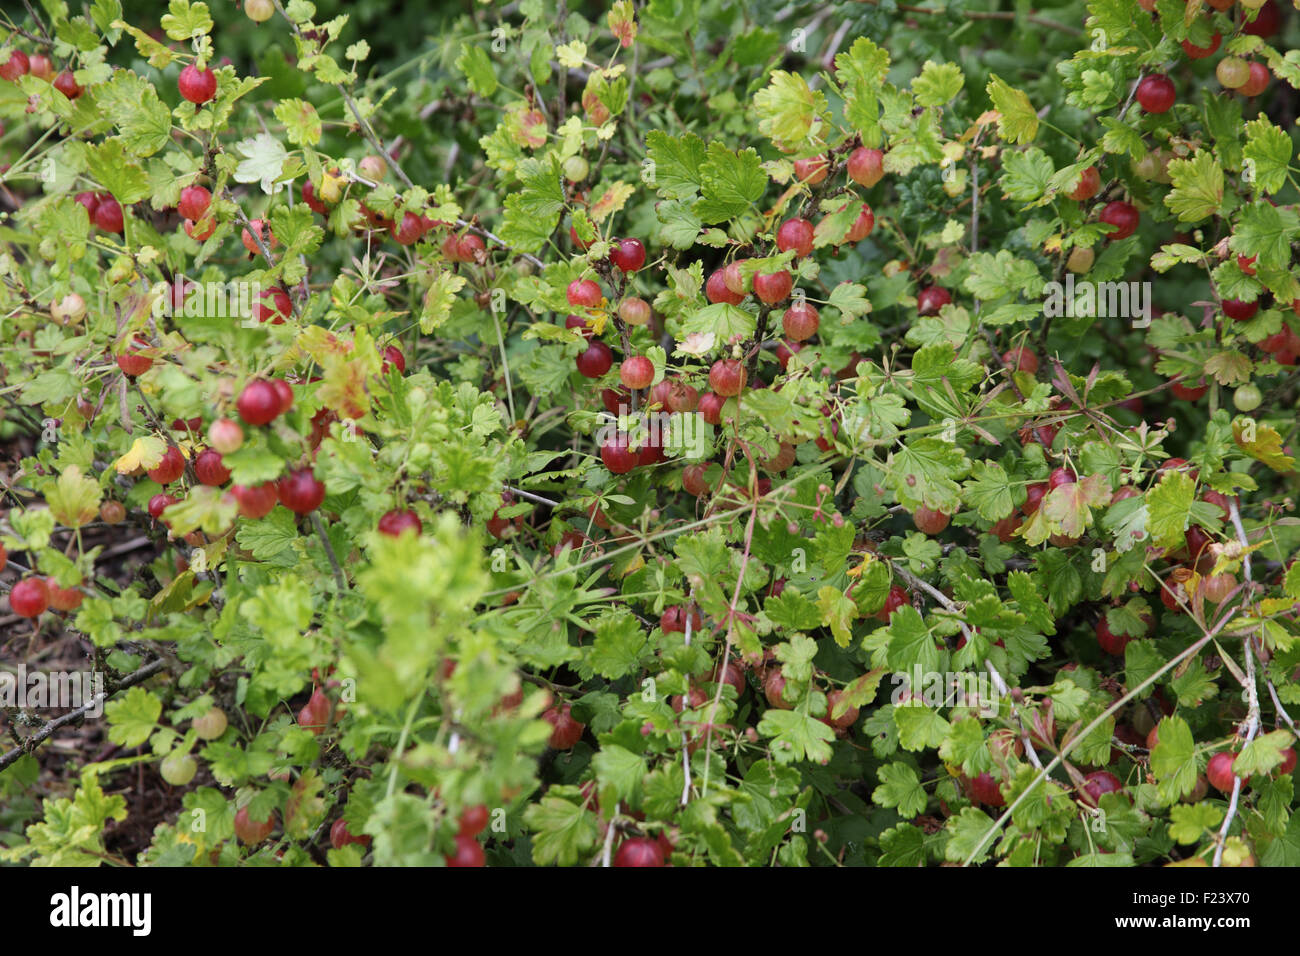 Ribes uva-crispa 'Hino Maki' Gooseberry fruit on bush - Stock Image